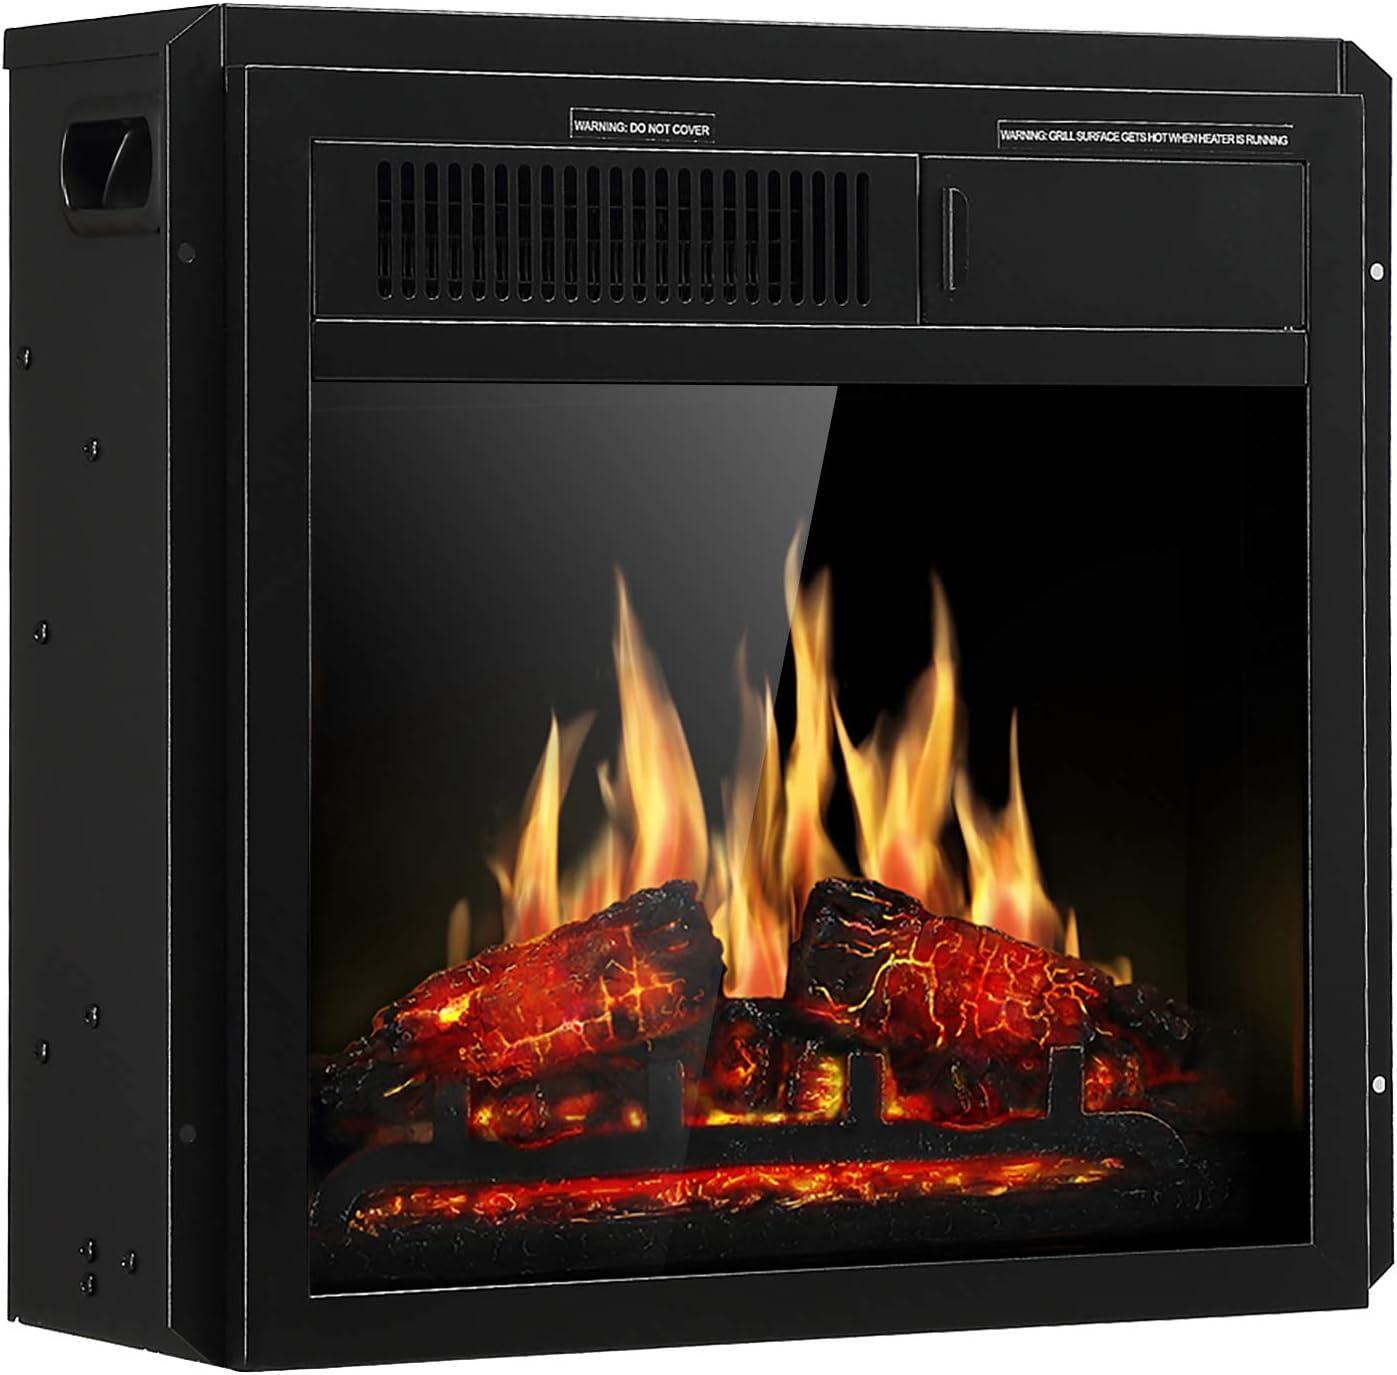 JAMFLY Electric Fireplace Insert 20